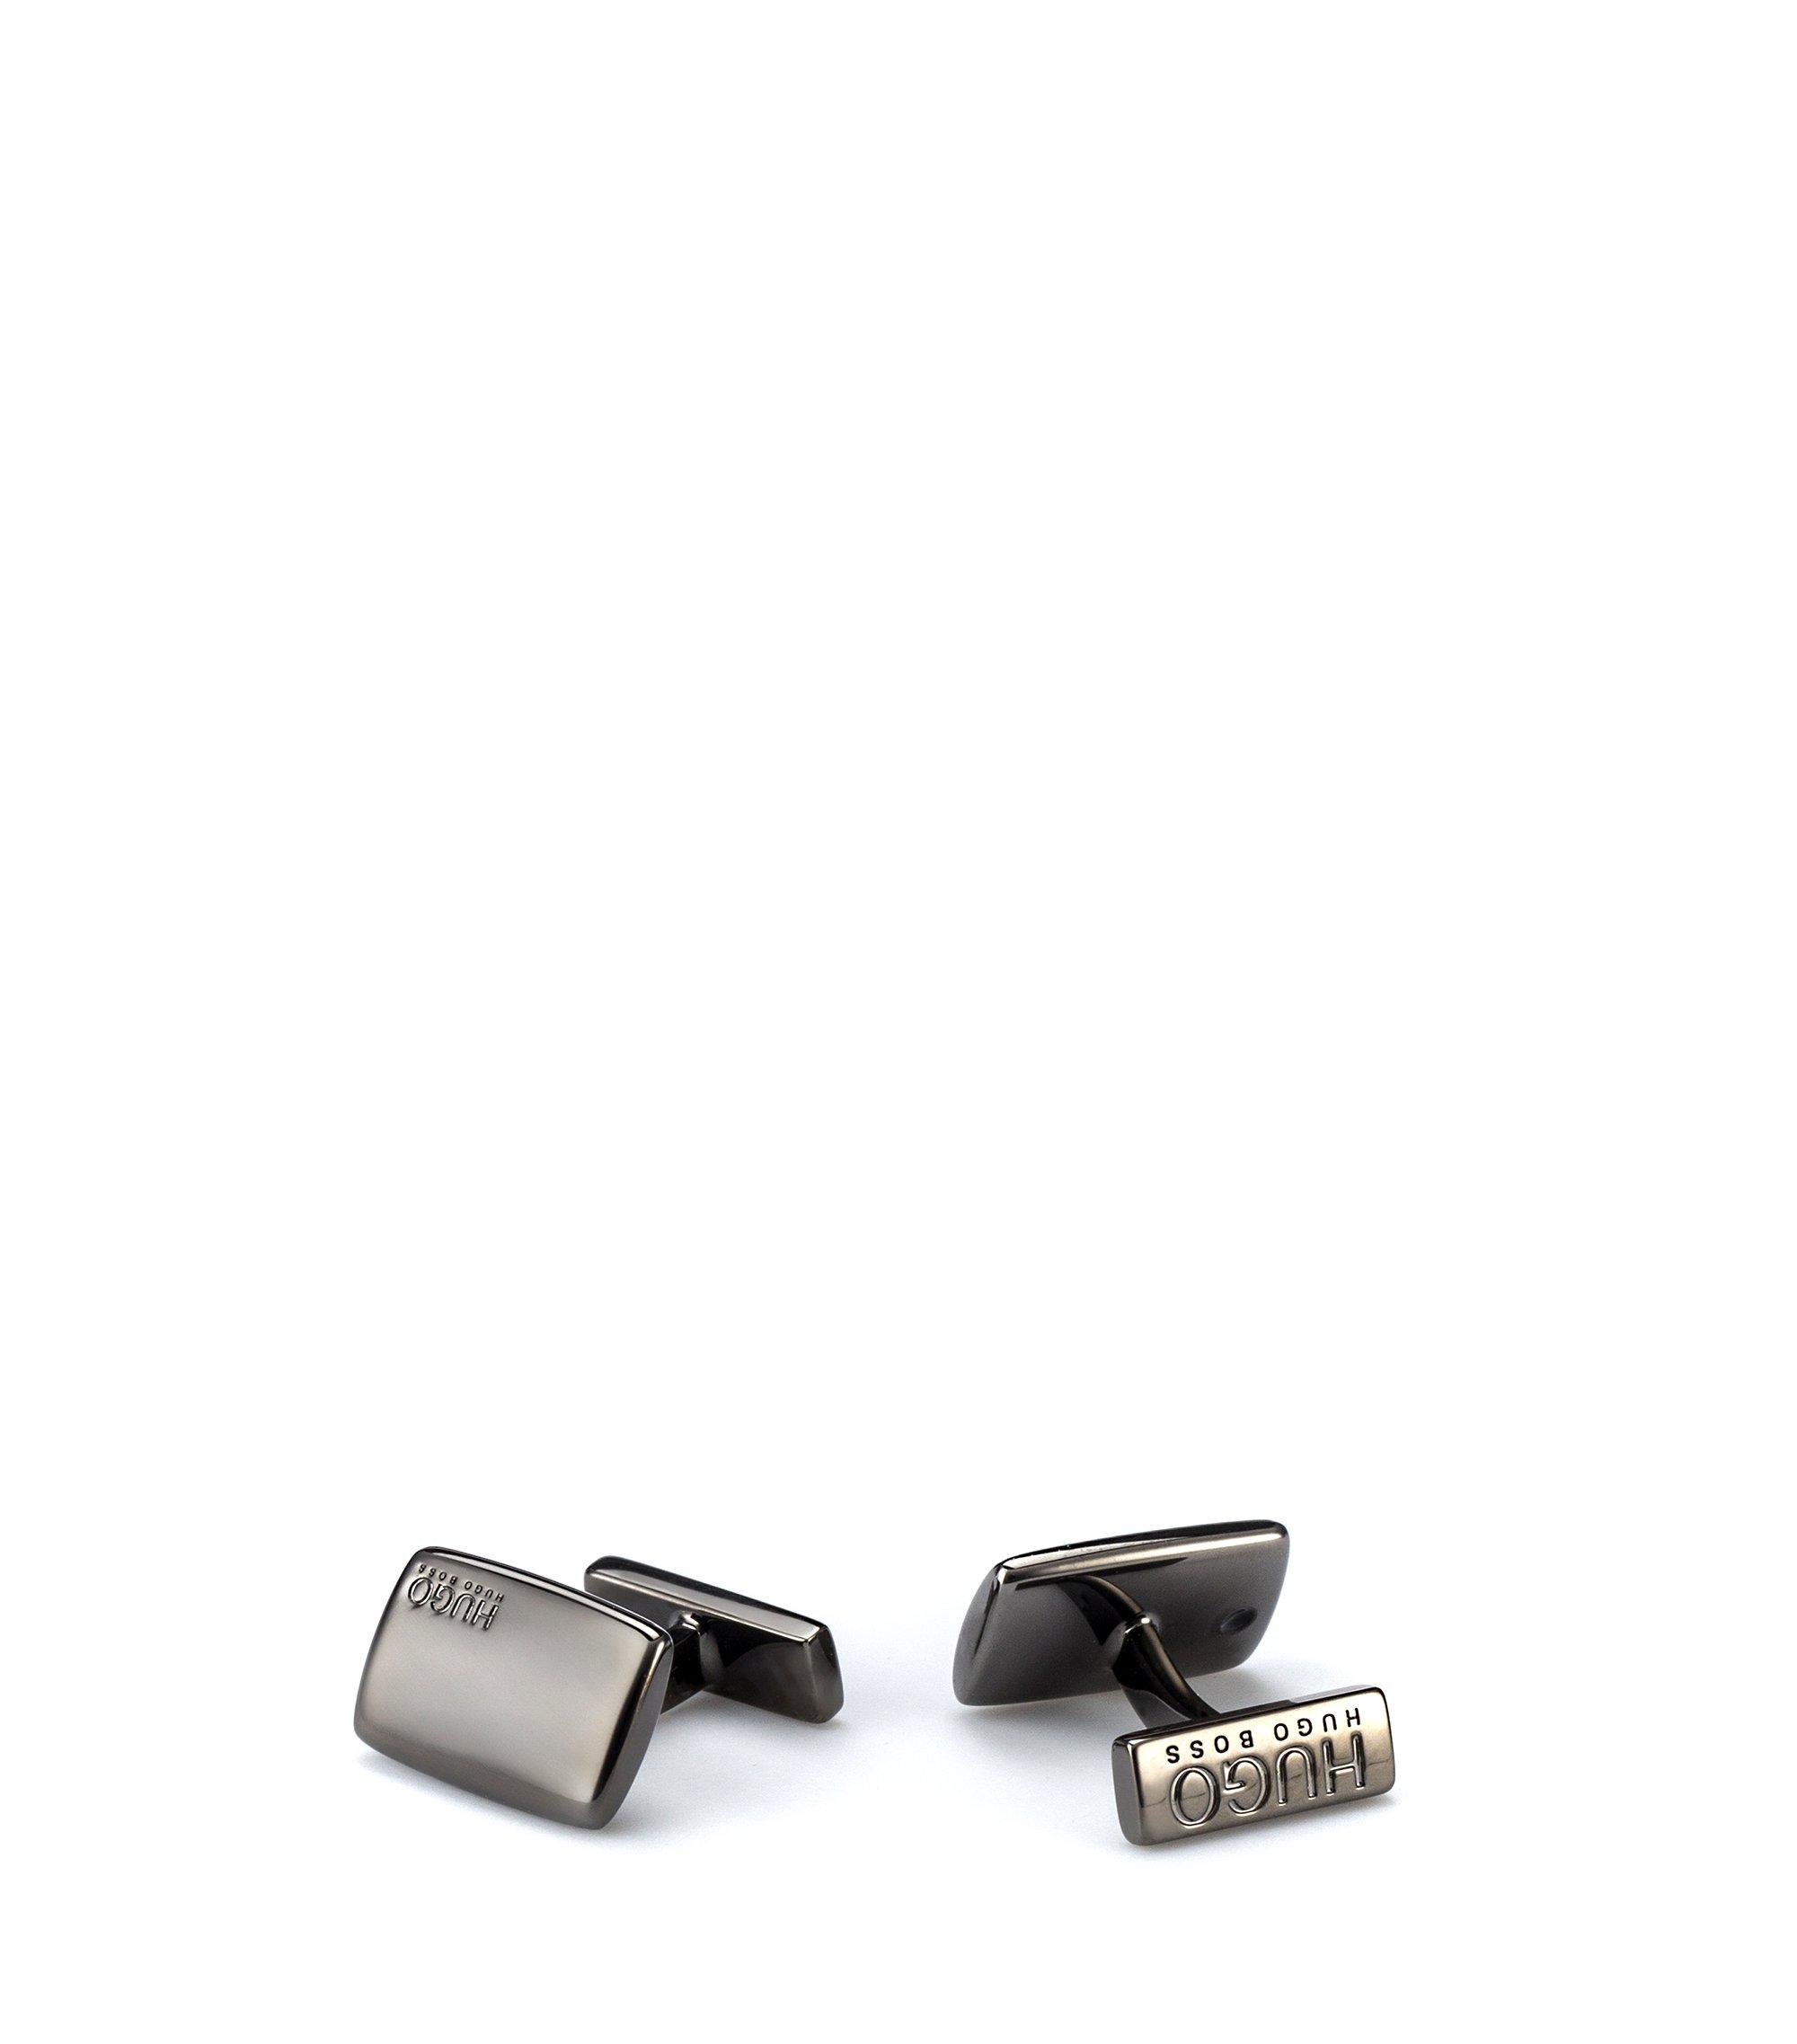 Rechthoekige manchetknopen met vast dwarsstaafje, Donkergrijs